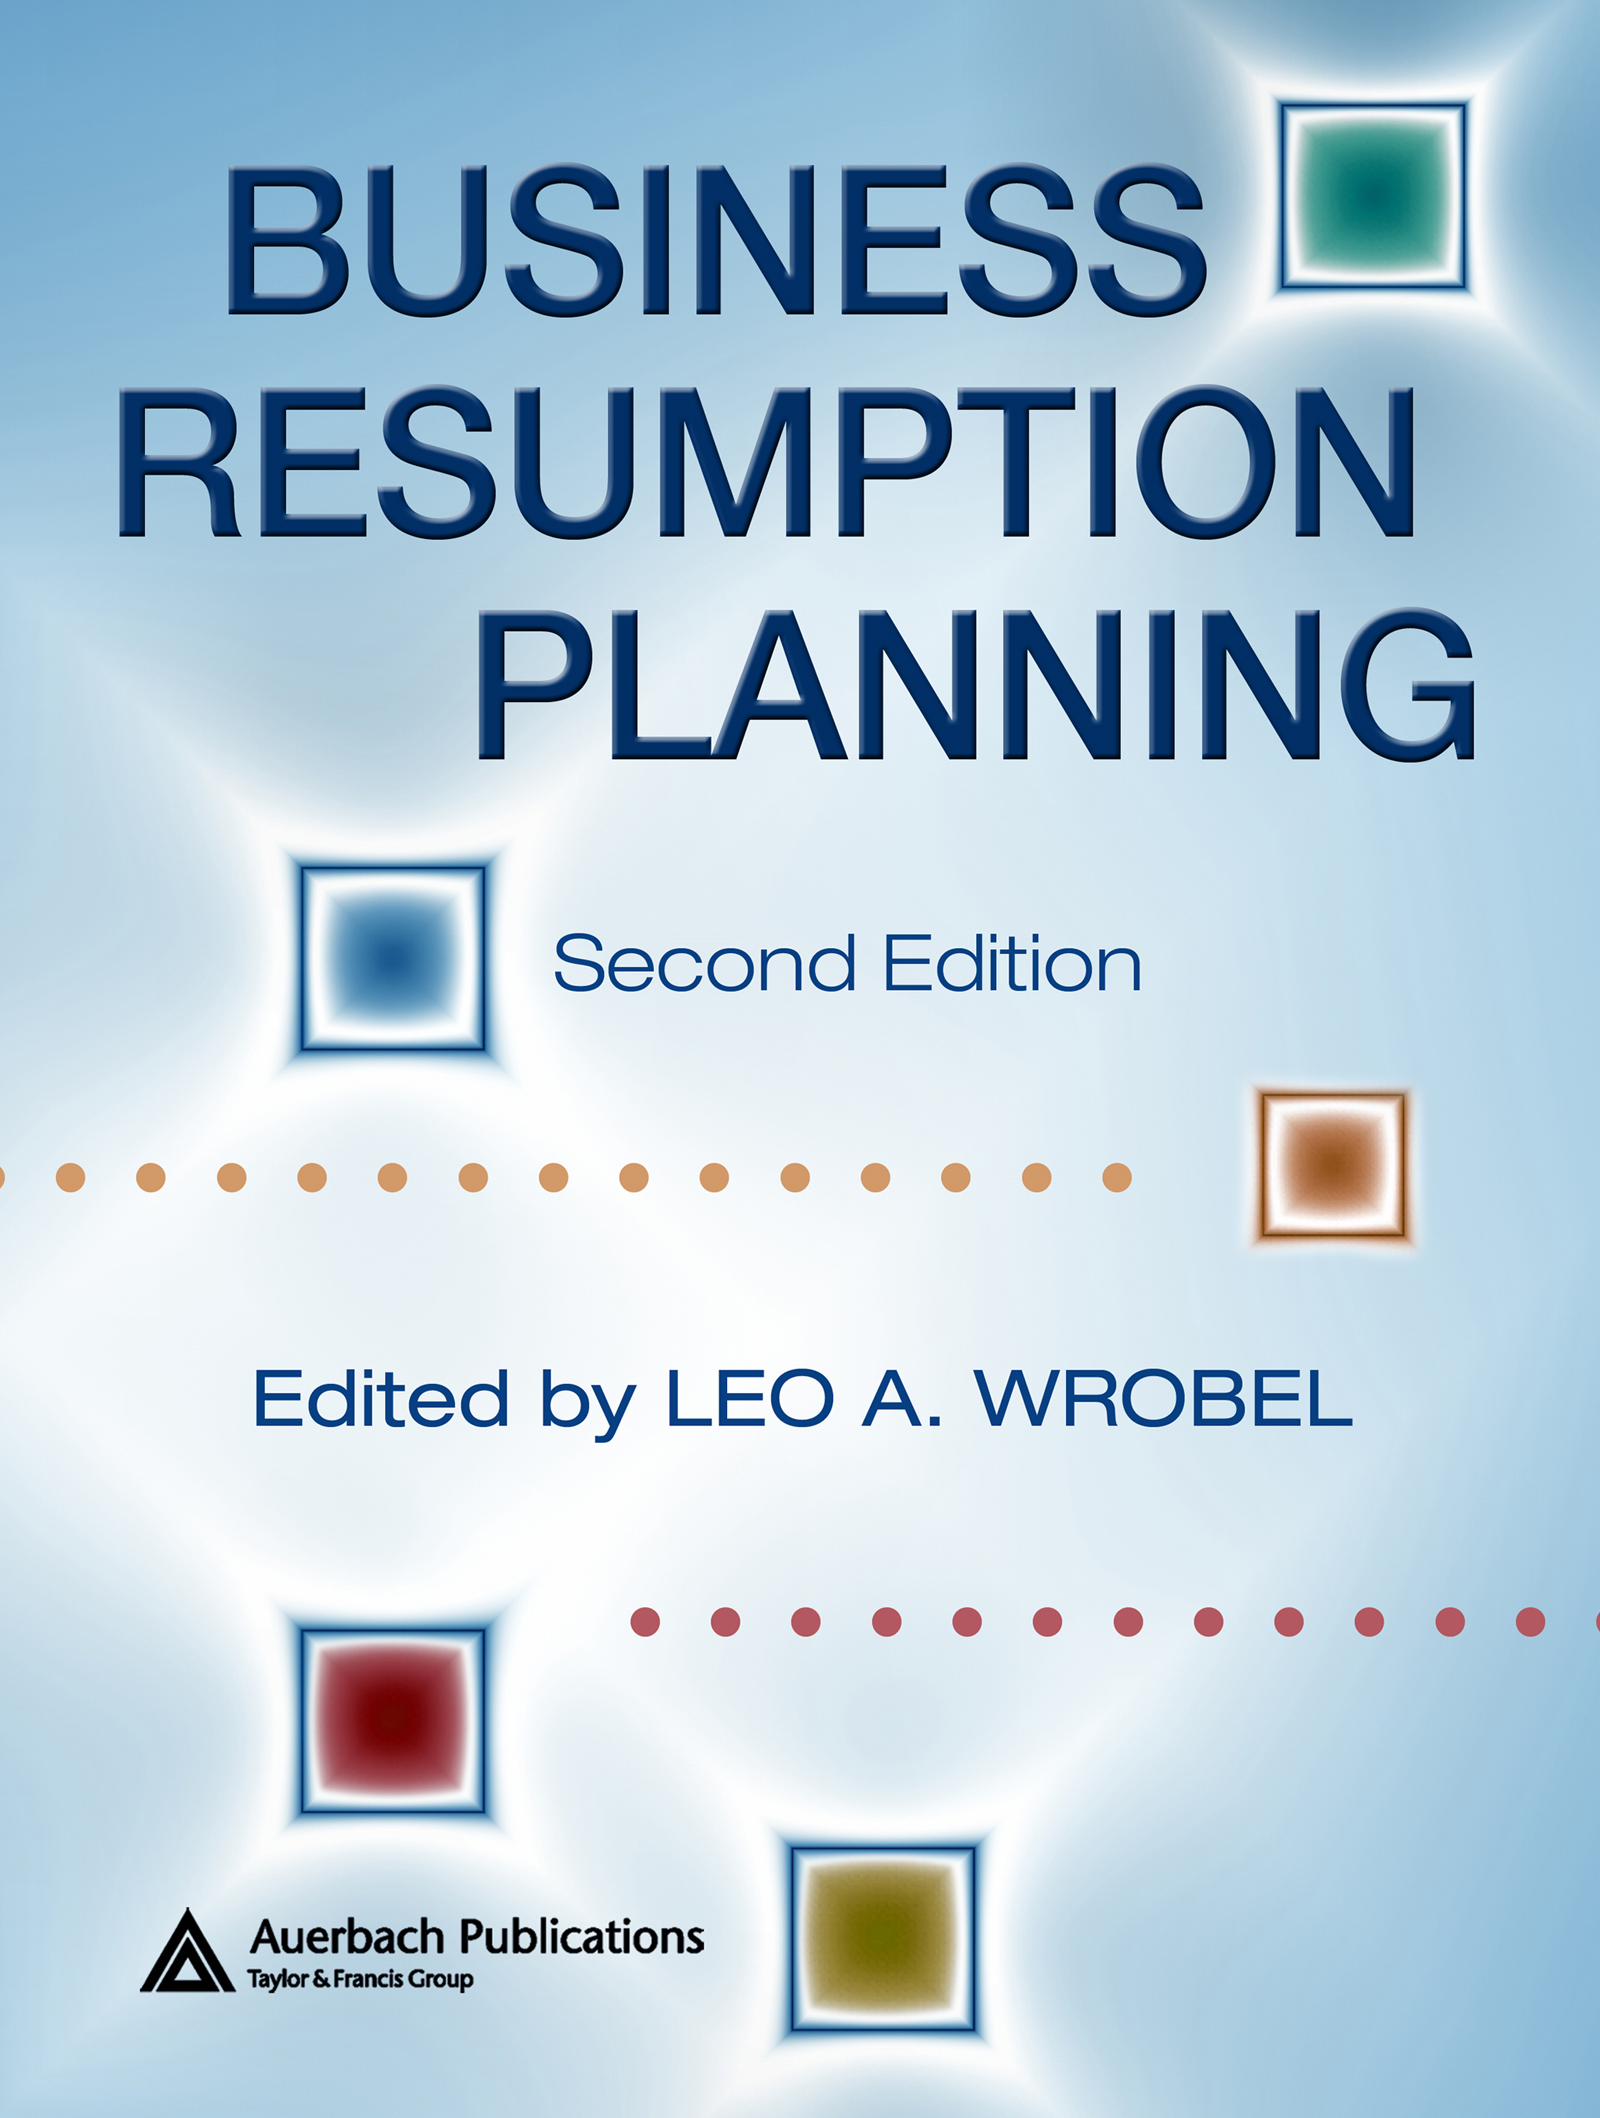 Business Resumption Planning